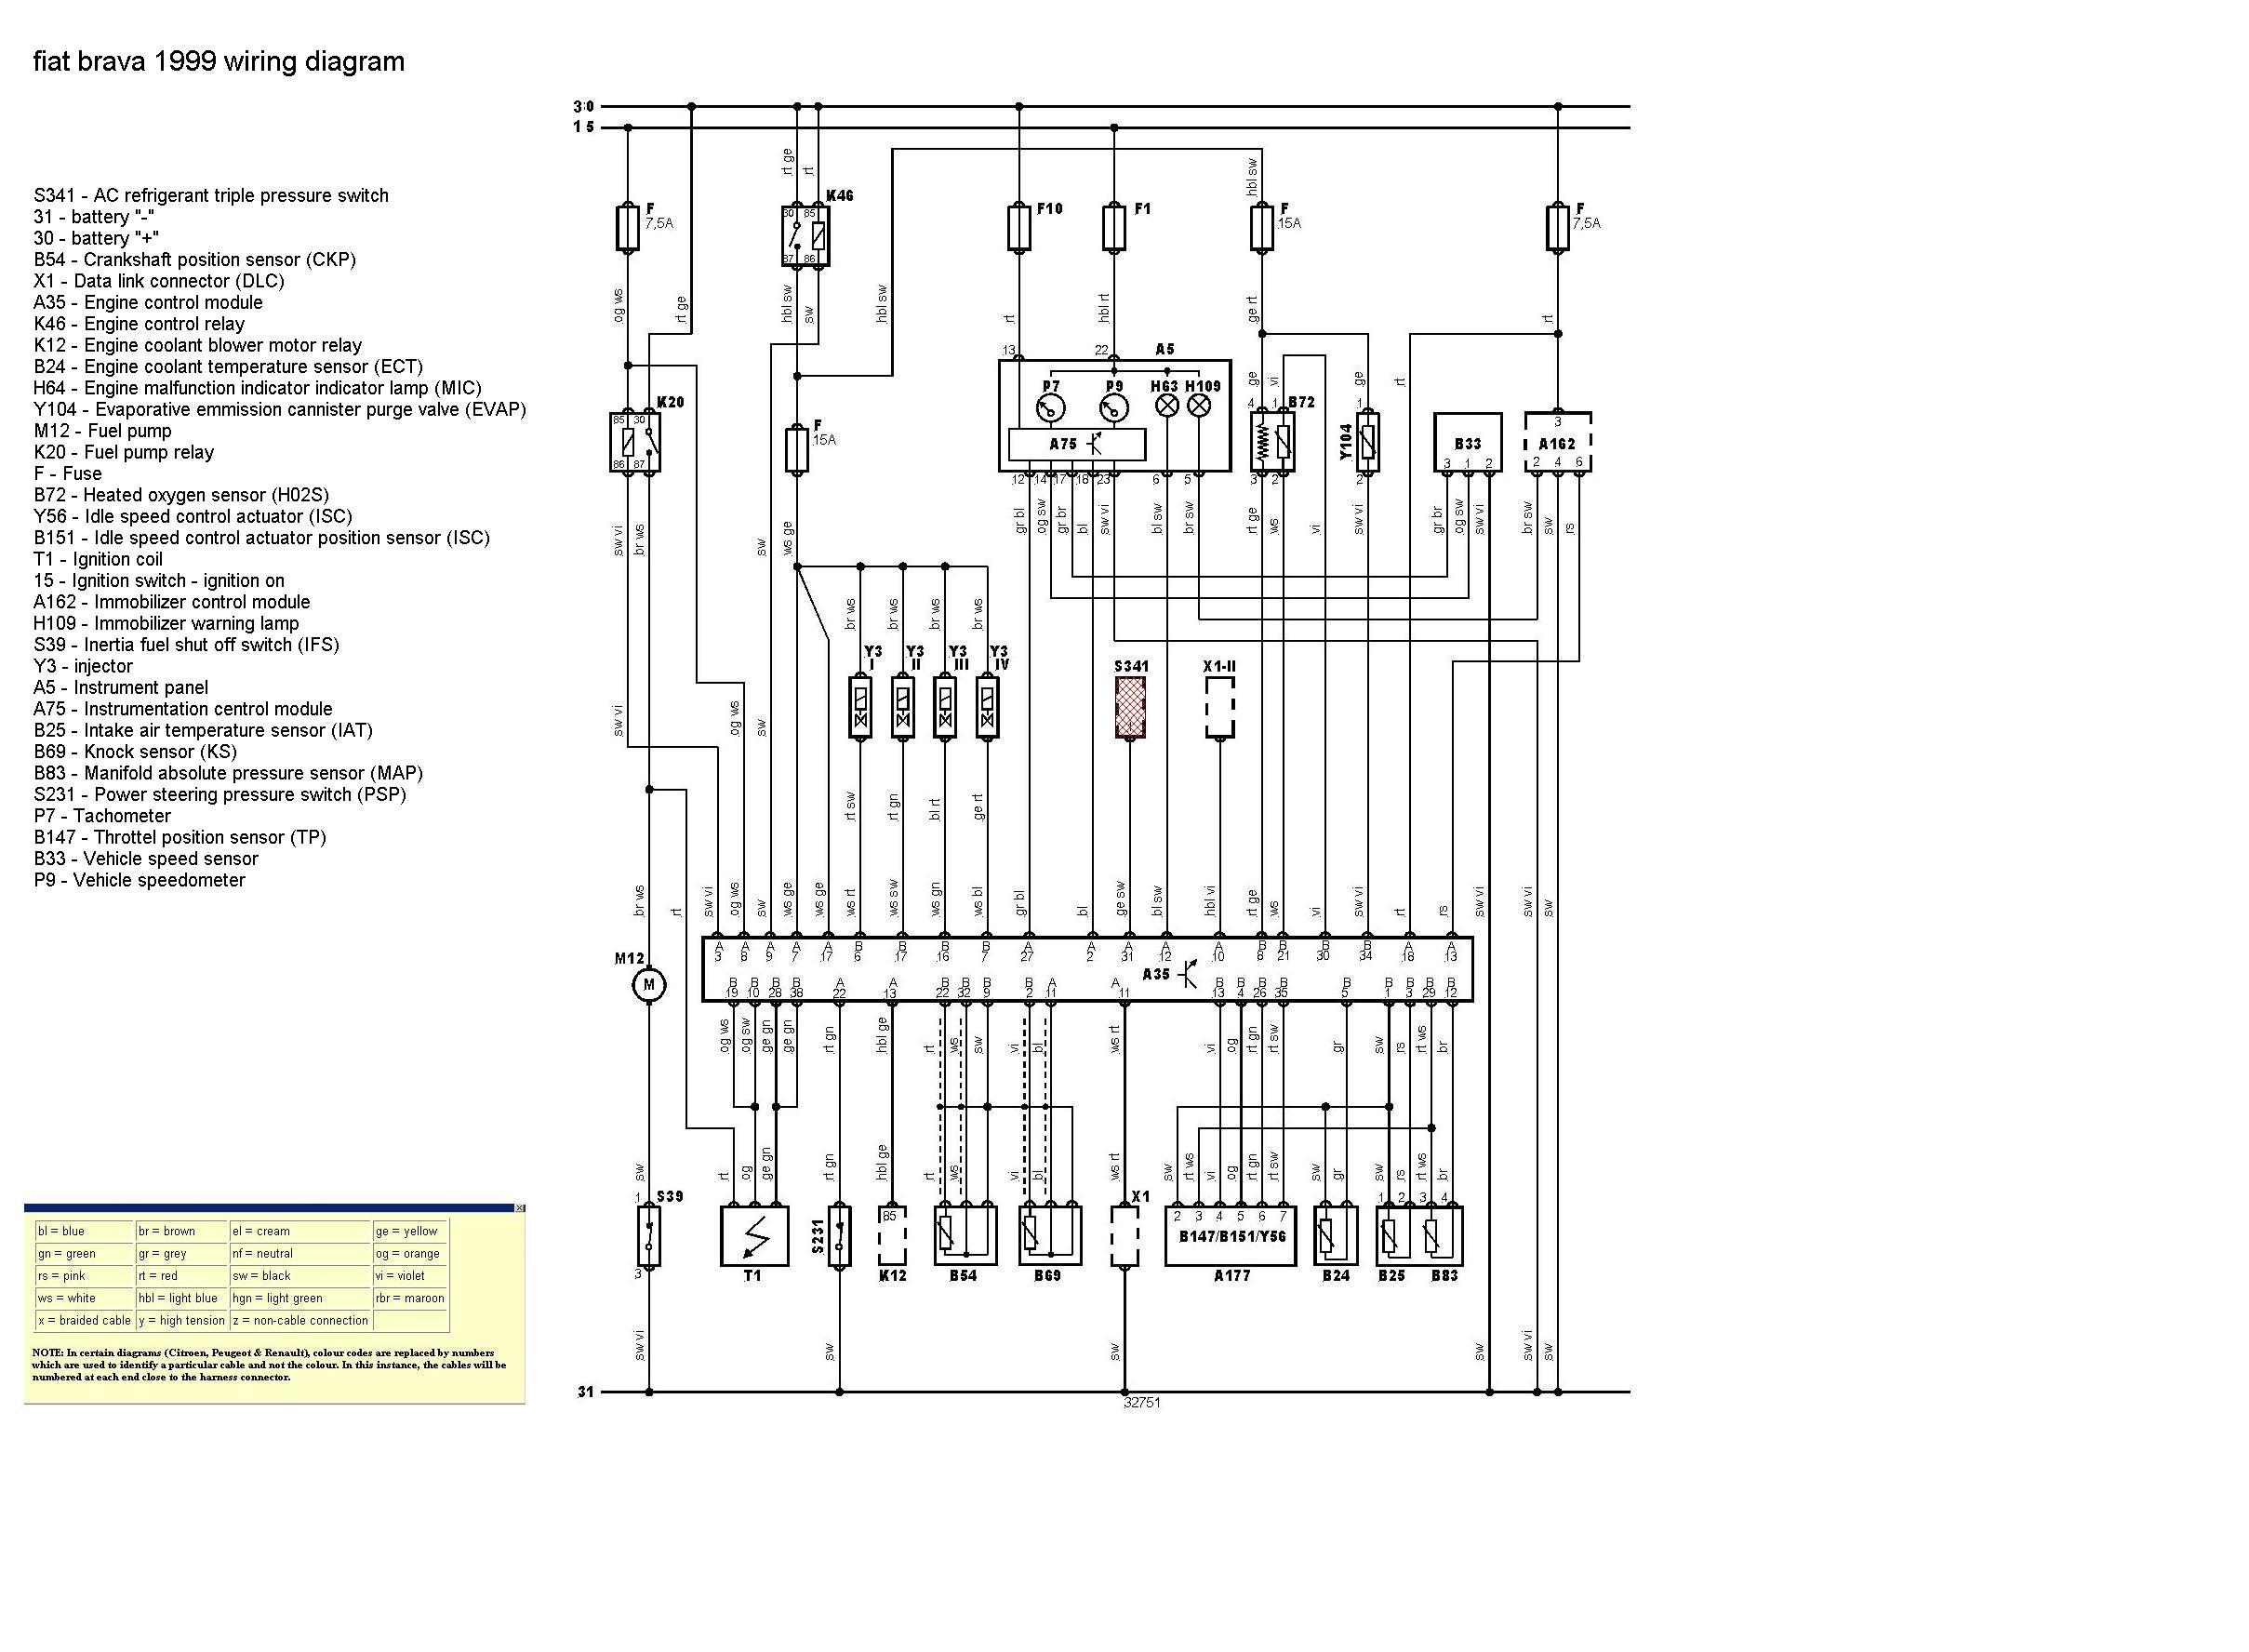 Complete 1999 Bravo Wiring Diagram